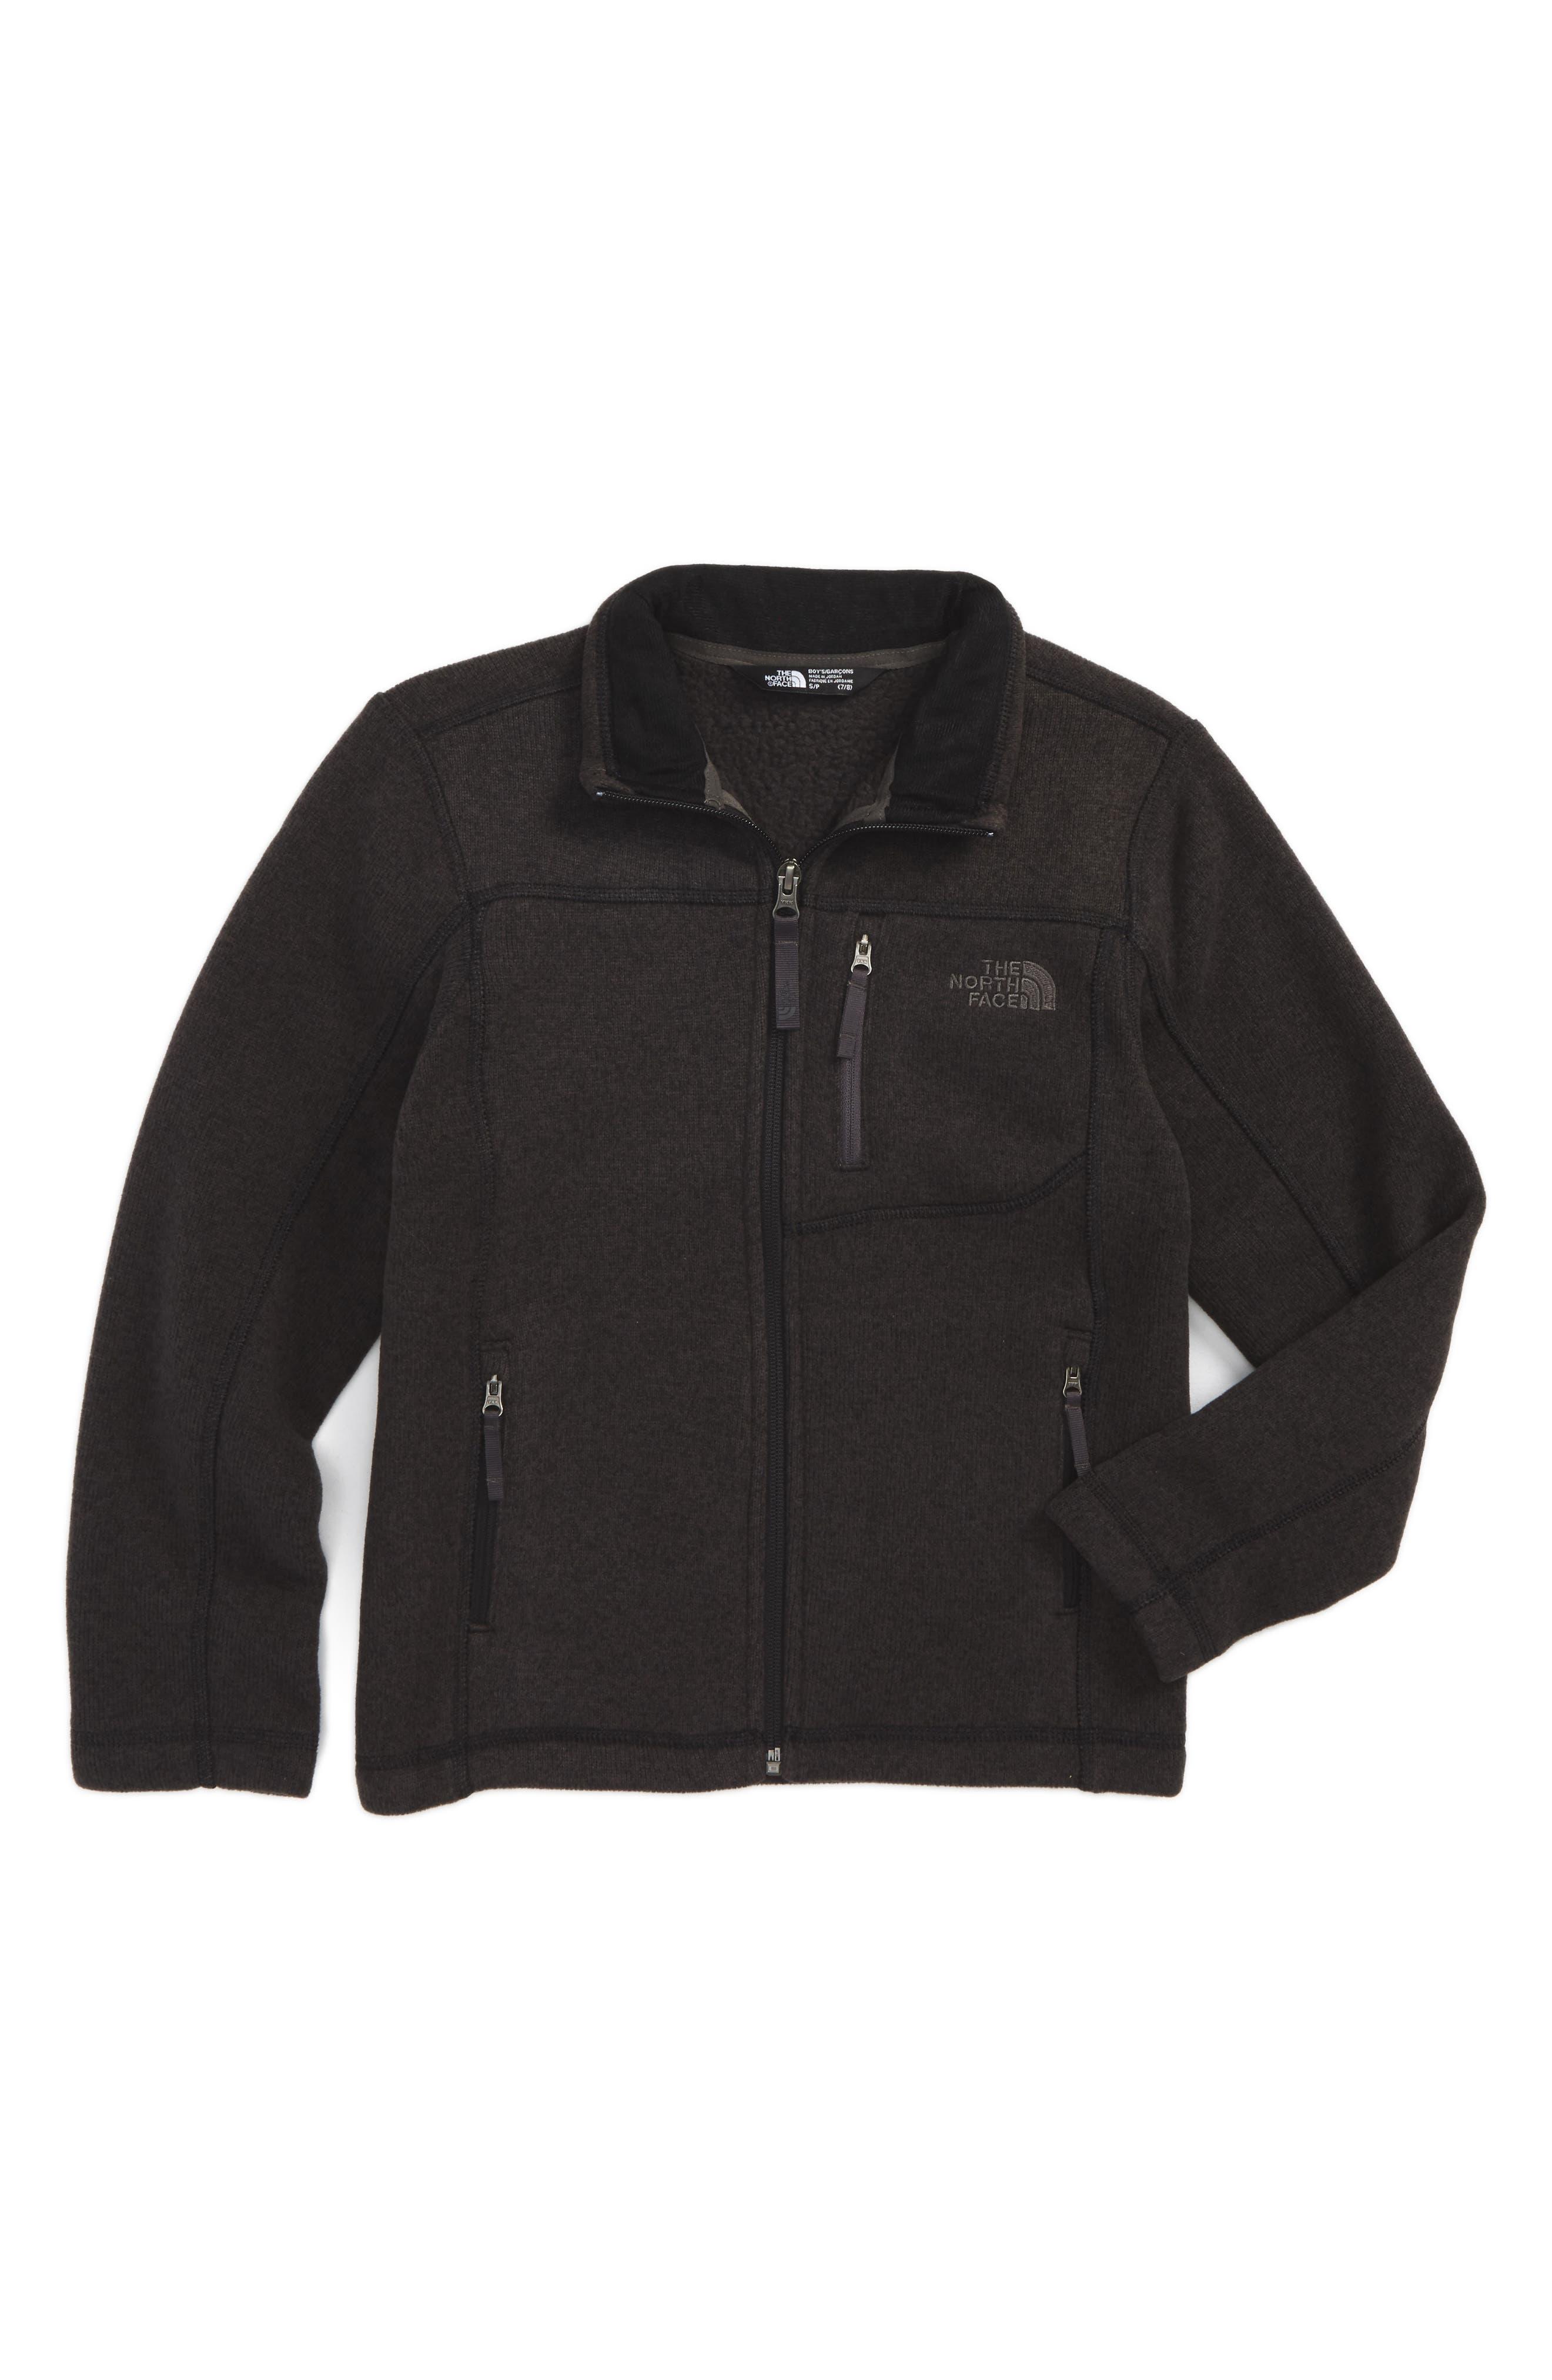 Gordon Lyons Sweater Fleece Zip Jacket,                             Main thumbnail 1, color,                             001